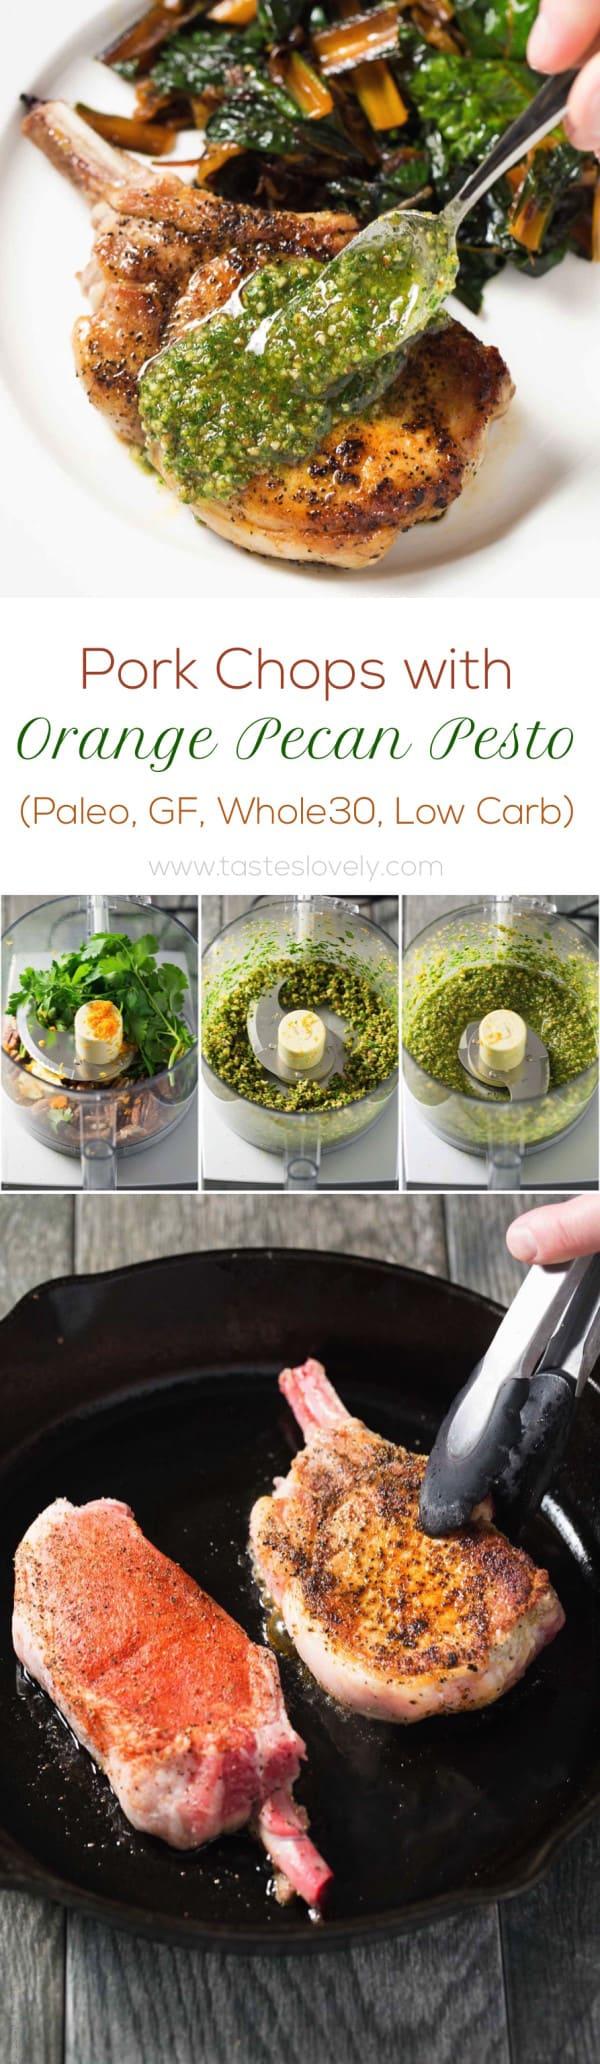 Pork Chops with Orange Pecan Pesto (Paleo, Gluten Free, Whole30, Low Carb)